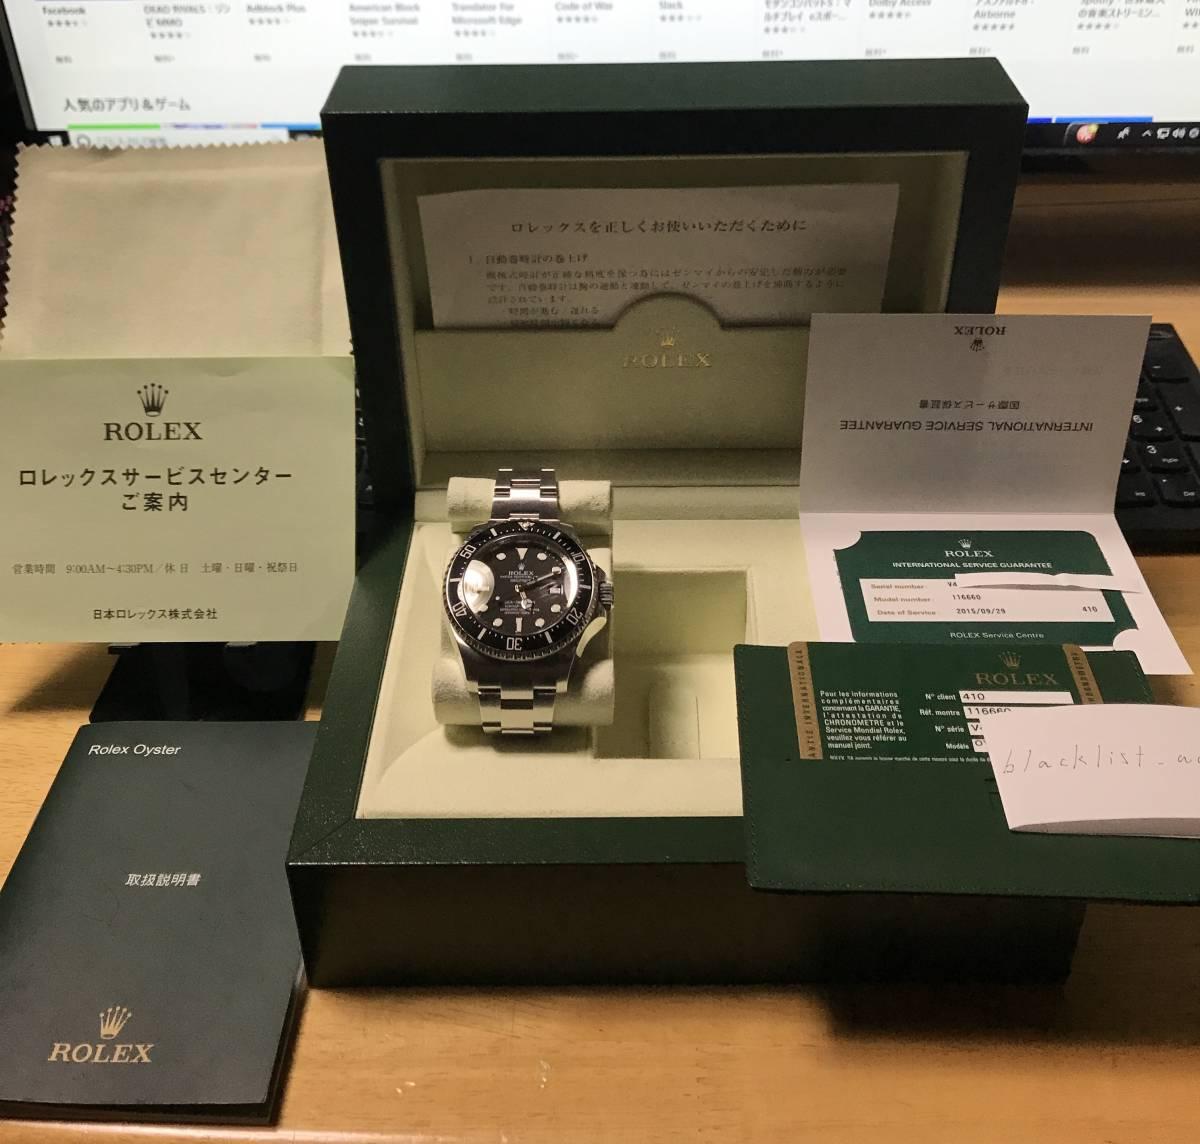 【ROLEX / Seedu錯誤/深海/ 116660 / V Mark 1錶盤】國內正品·經銷商保修期·畫廊和保修·房地產·稅 編號:c702951666